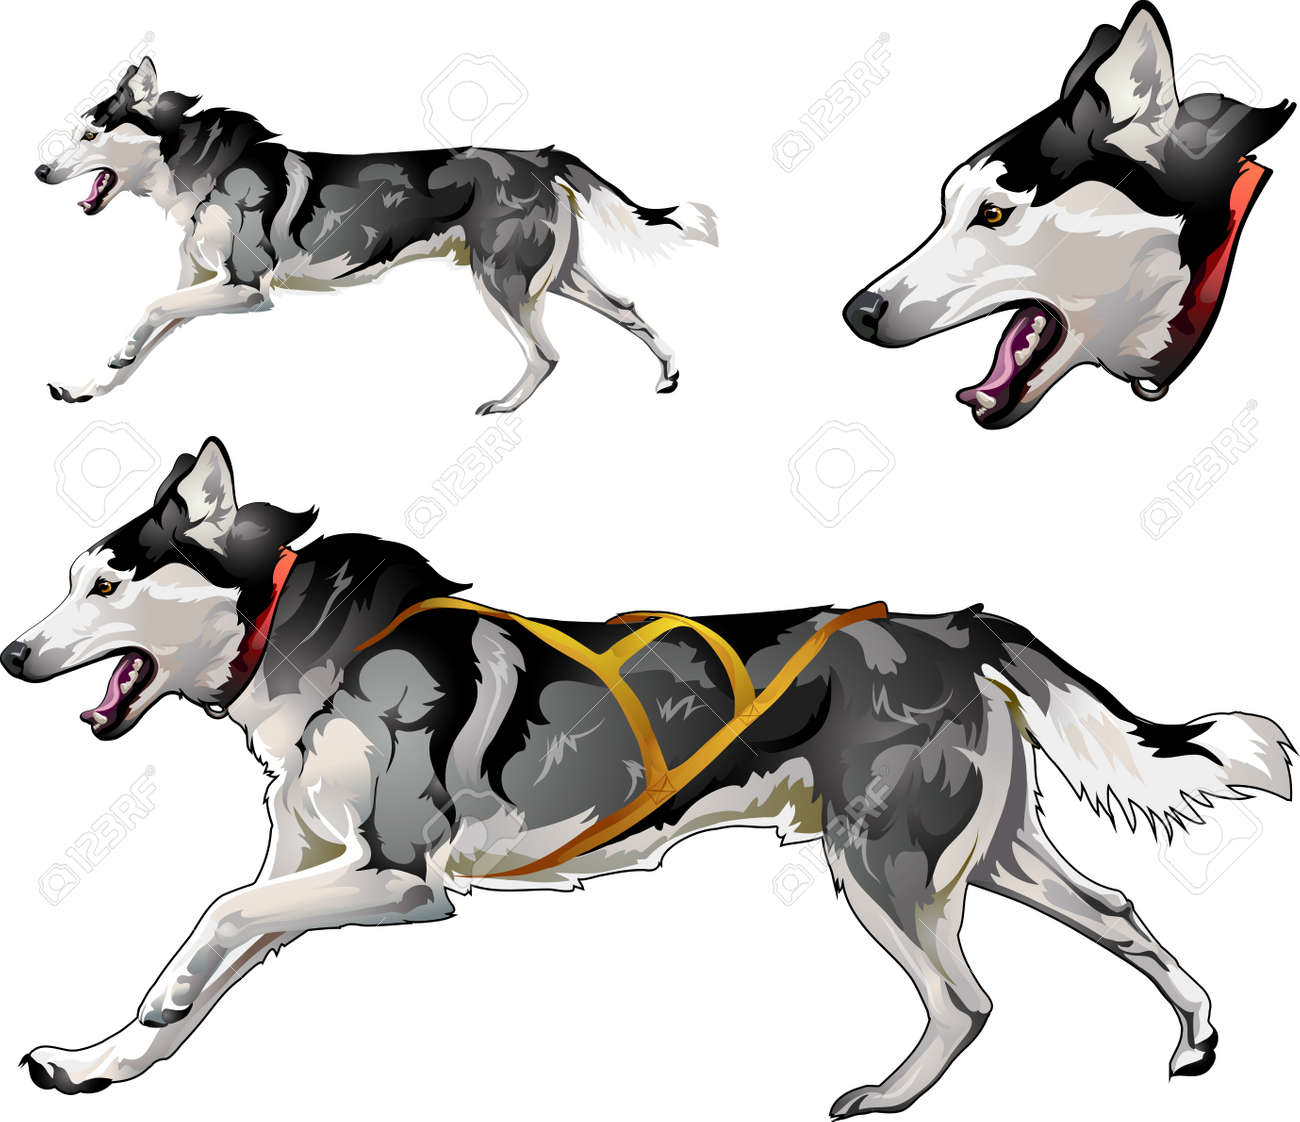 hight resolution of running sled dog of siberian husky breed stock vector 87930858